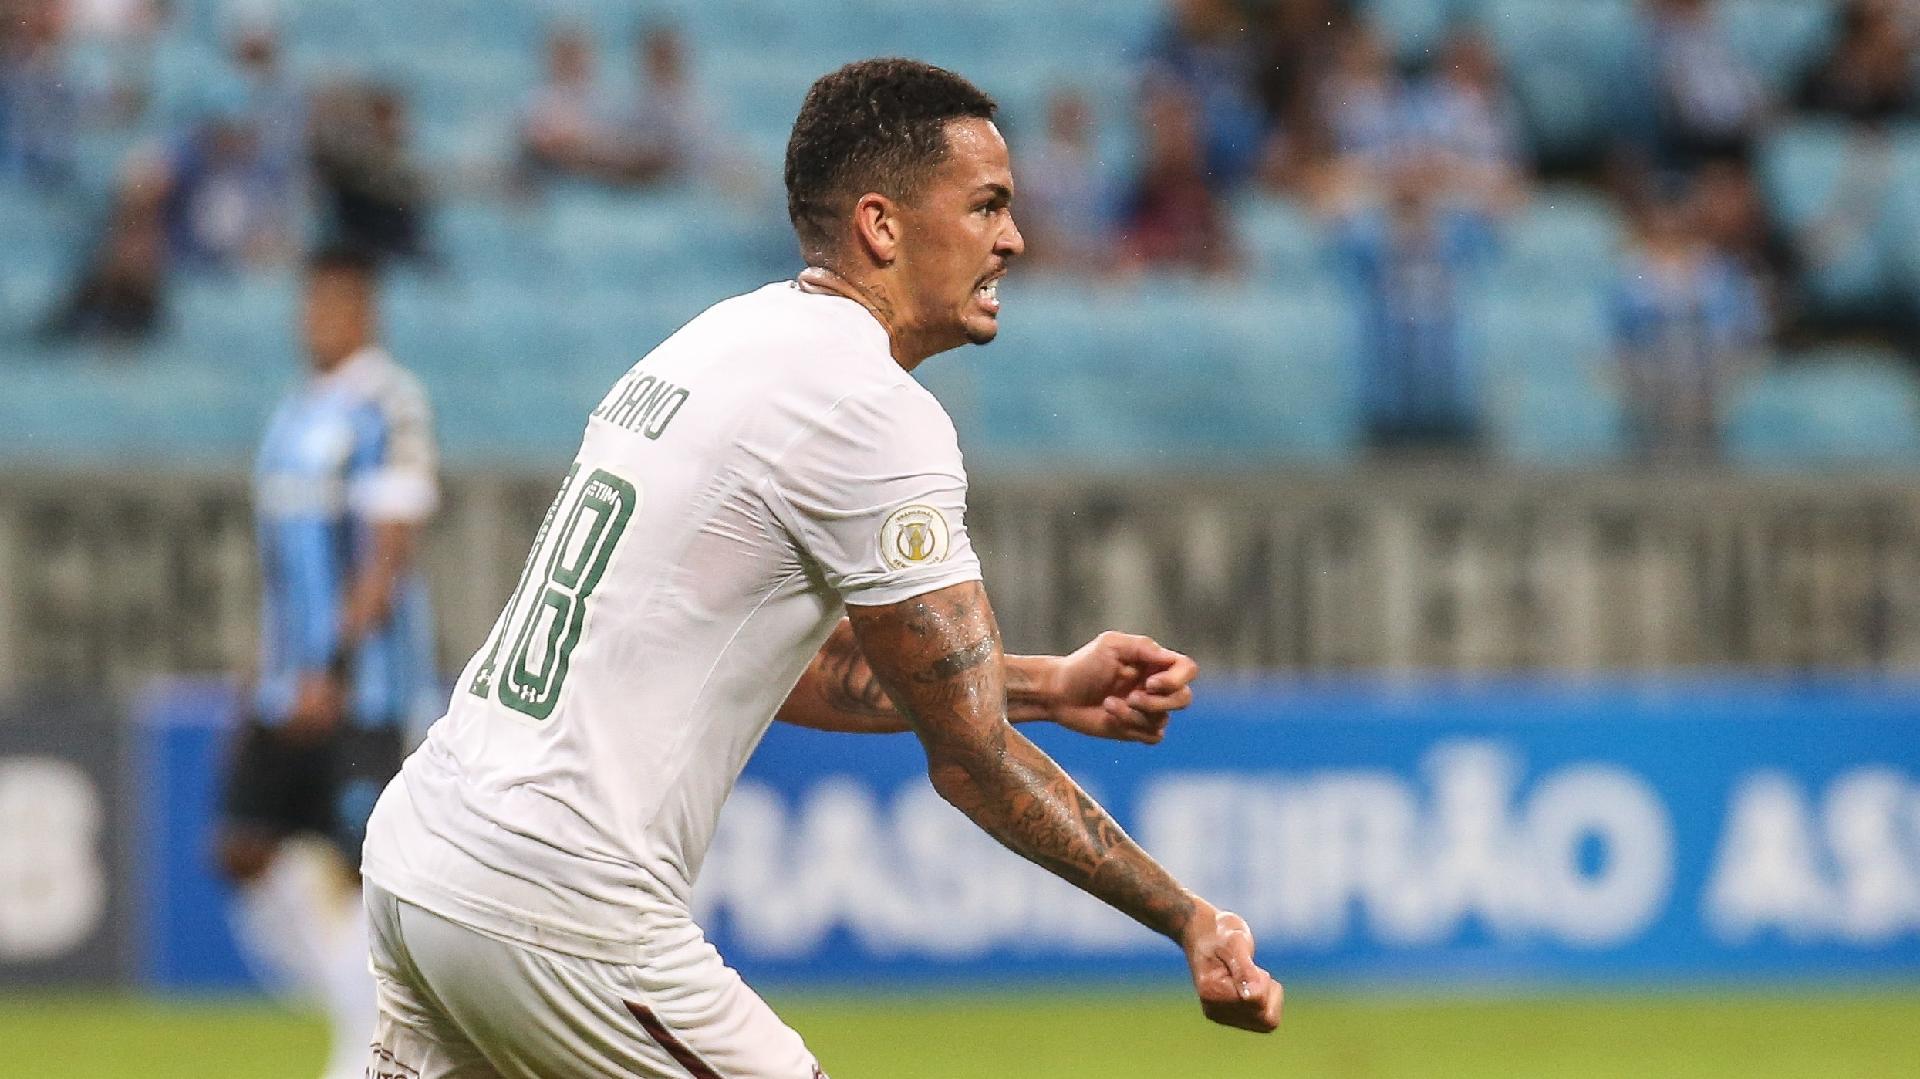 Luciano comemora gol do Fluminense contra o Grêmio